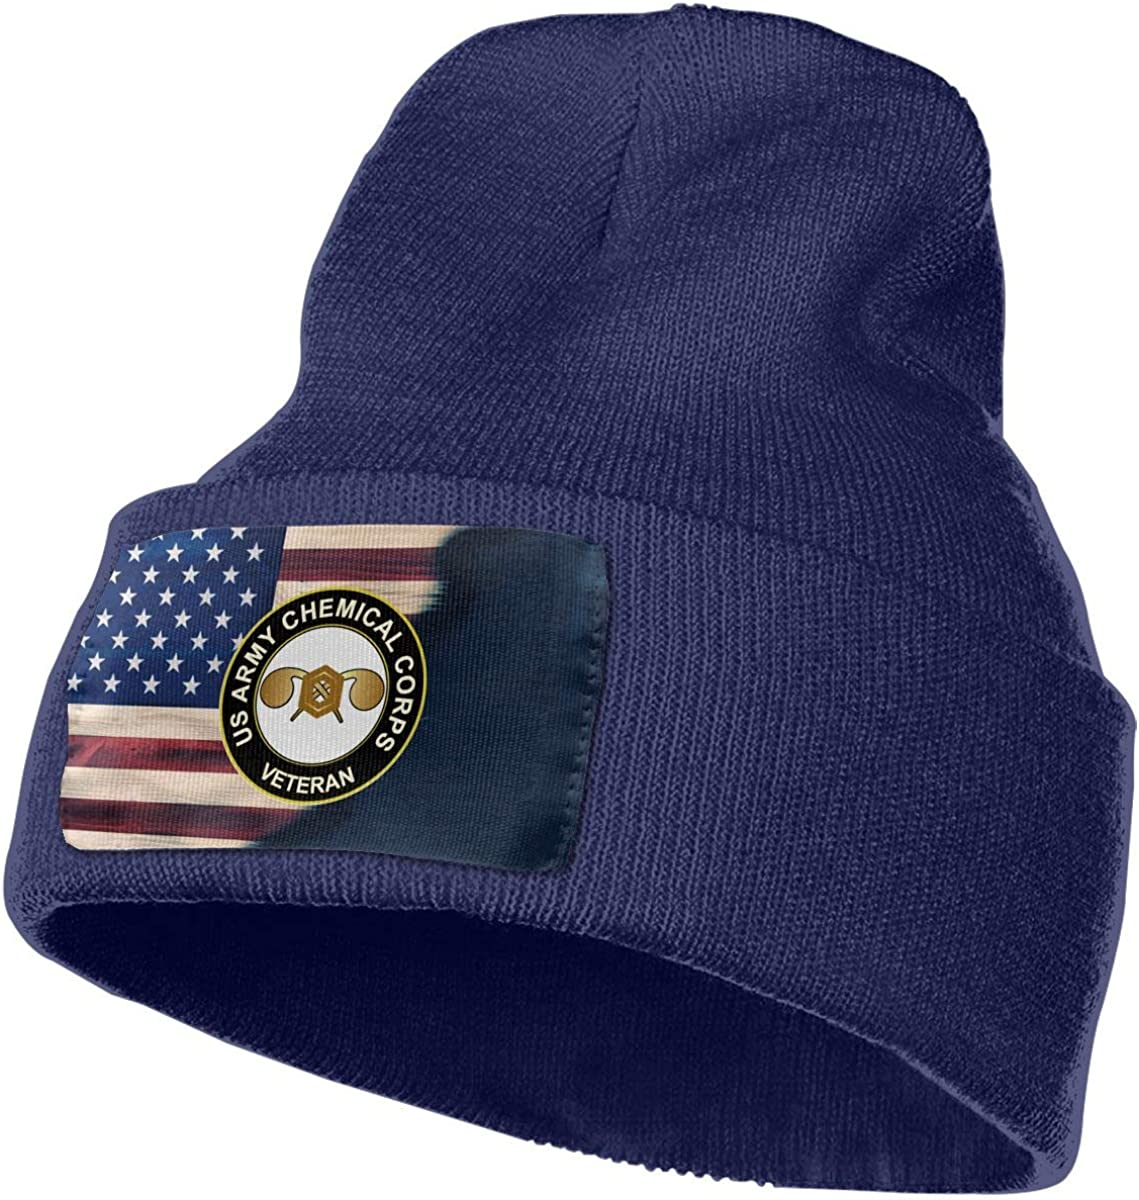 FORDSAN CP US Army Chemical Corps Mens Beanie Cap Skull Cap Winter Warm Knitting Hats.